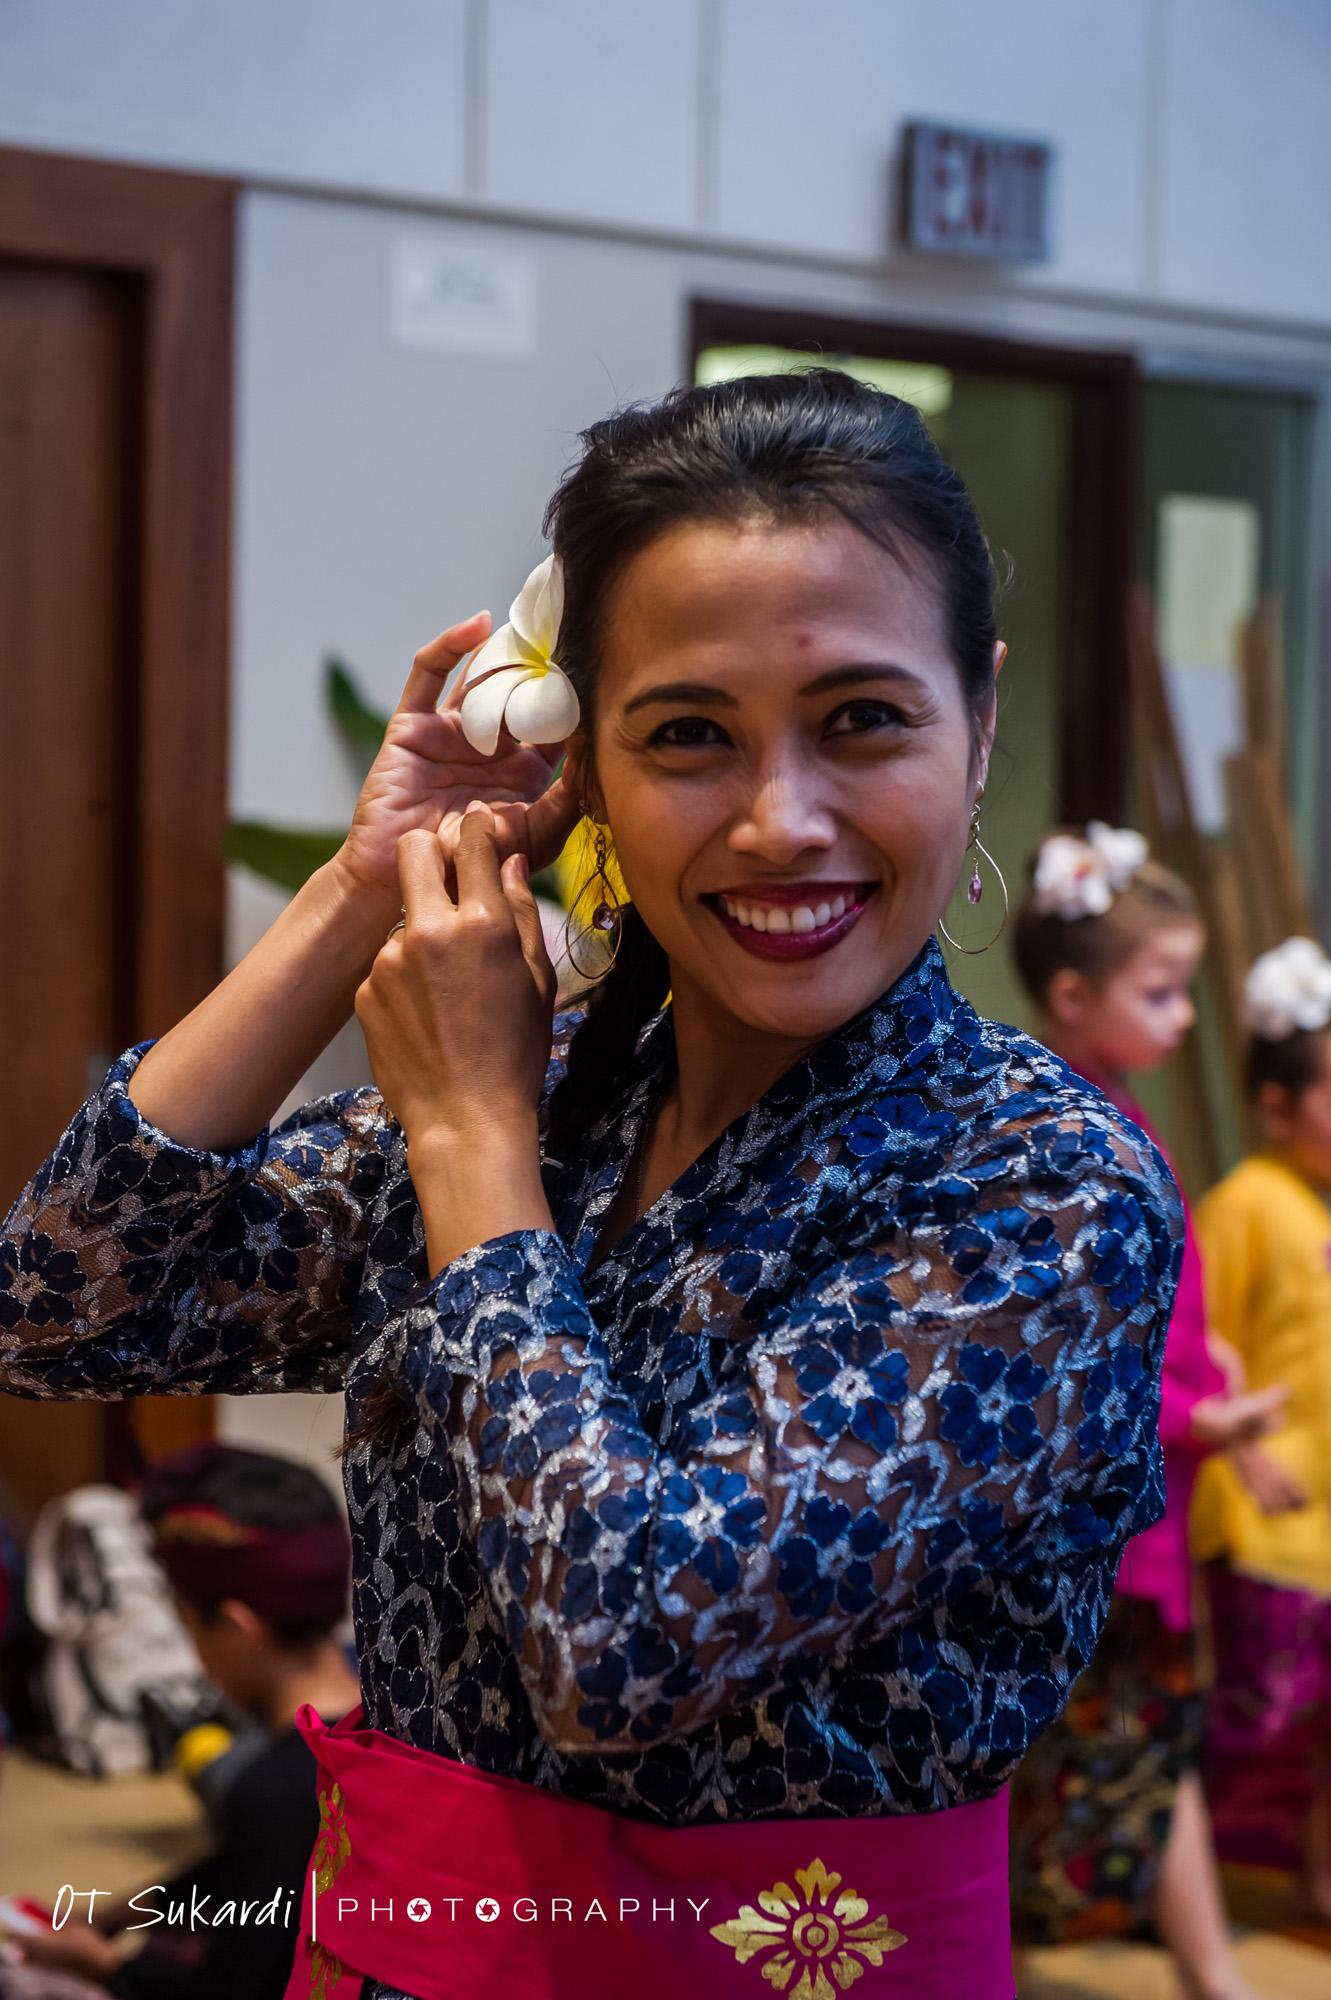 smiling performer fixing flower in her hair